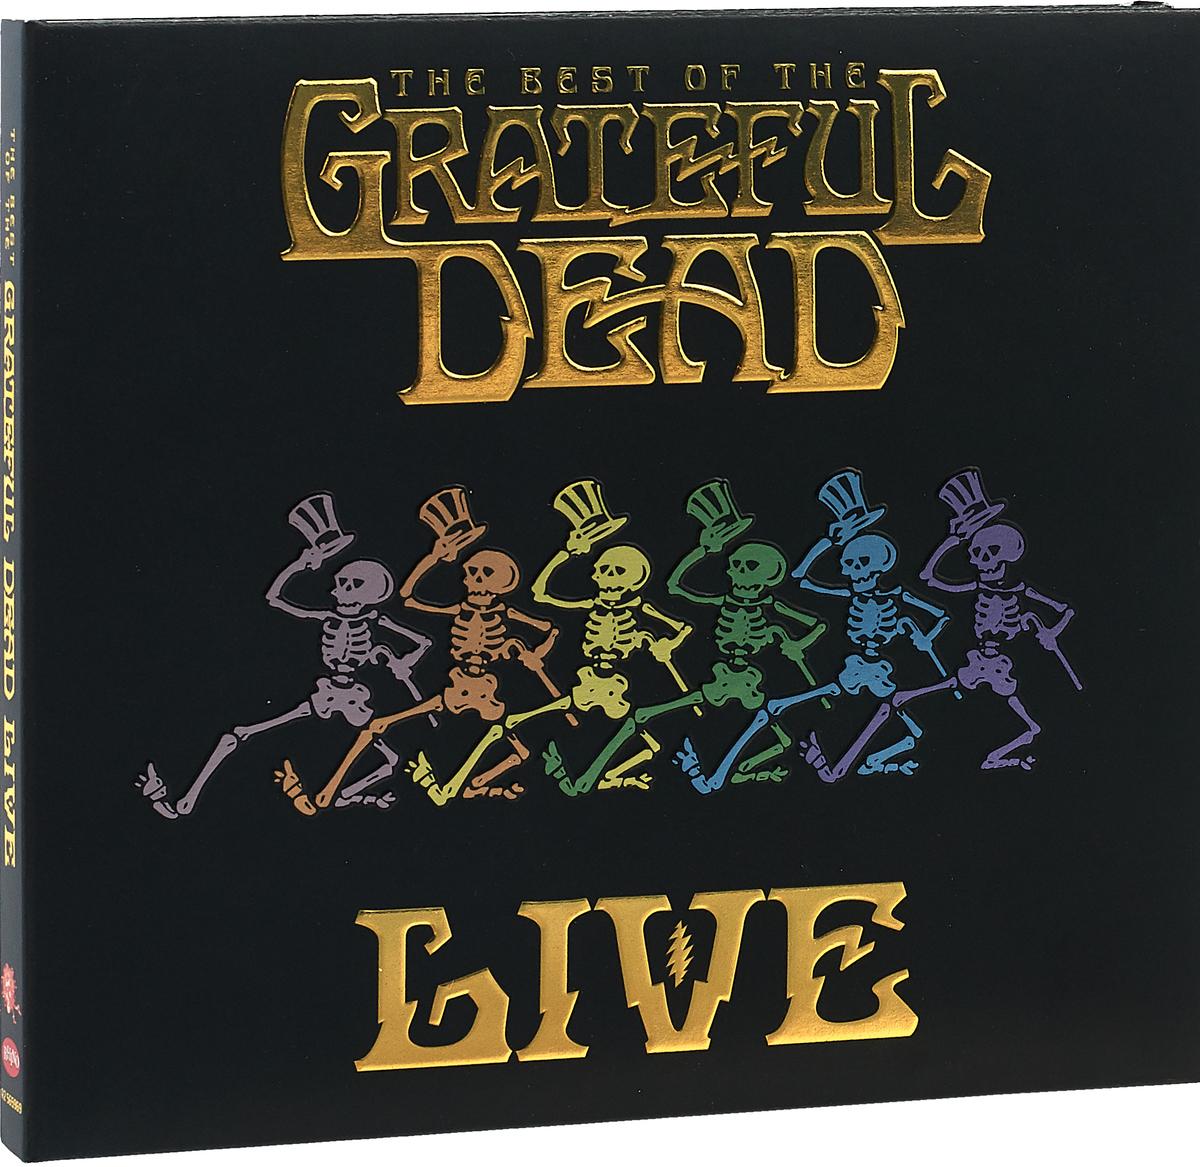 The Grateful Dead The Grateful Dead. The Best Of The Grateful Dead. Live (2 CD) the grateful dead grateful dead blues for allah